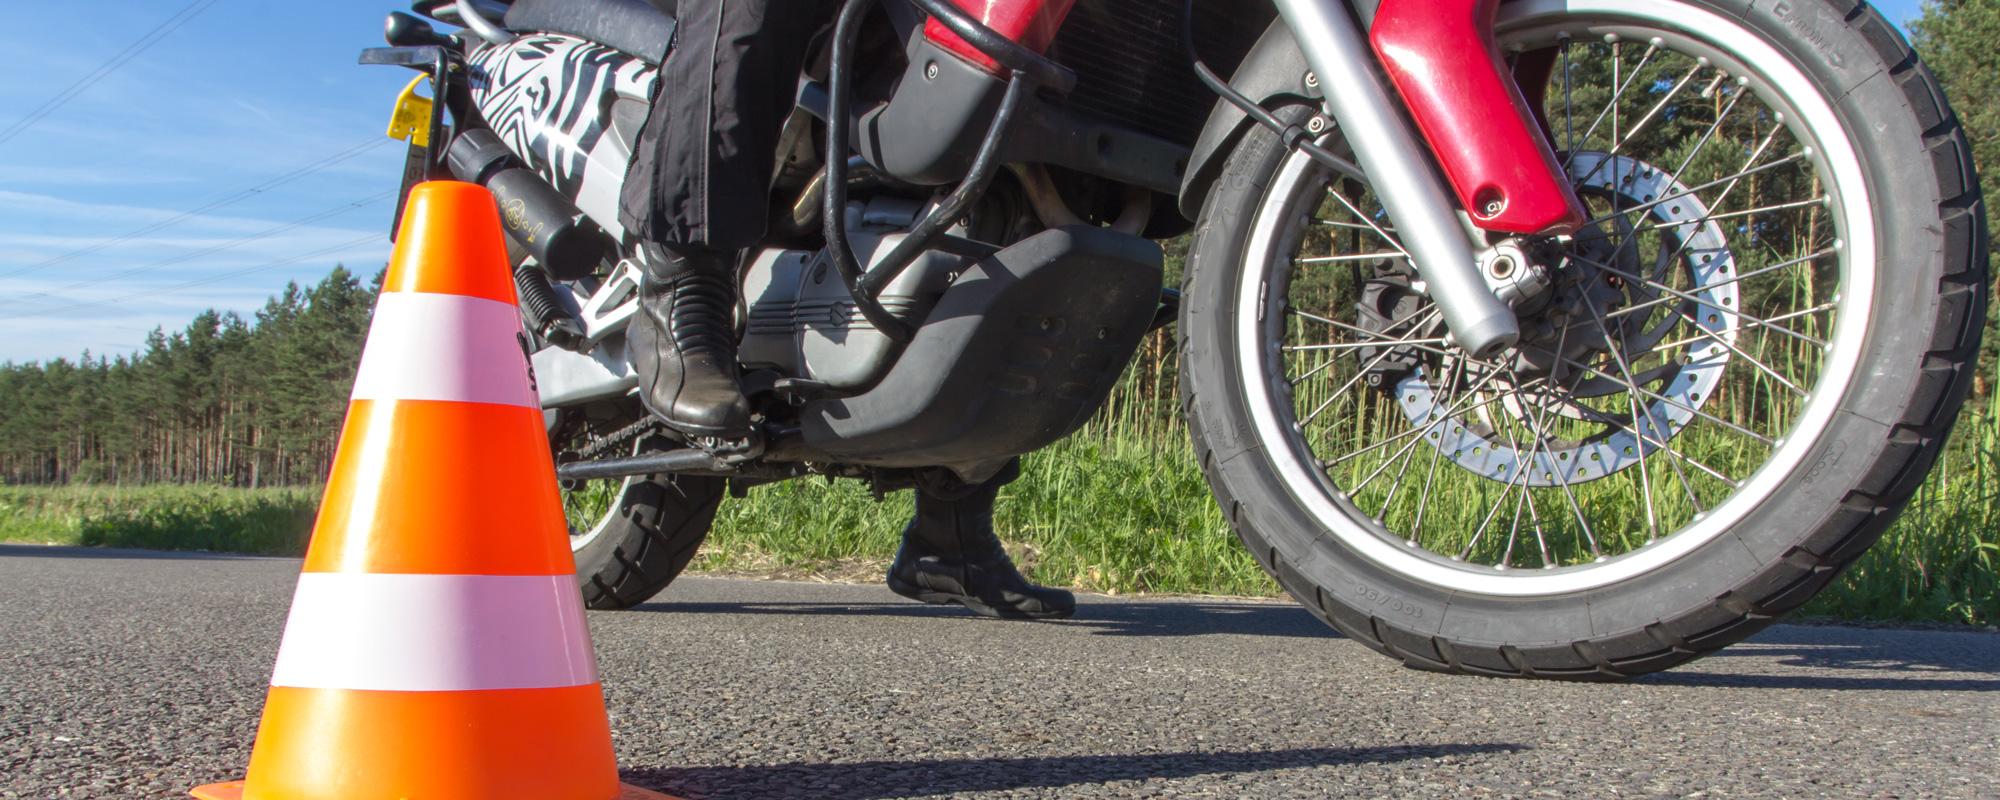 Formation Permis Moto / A1 / A2